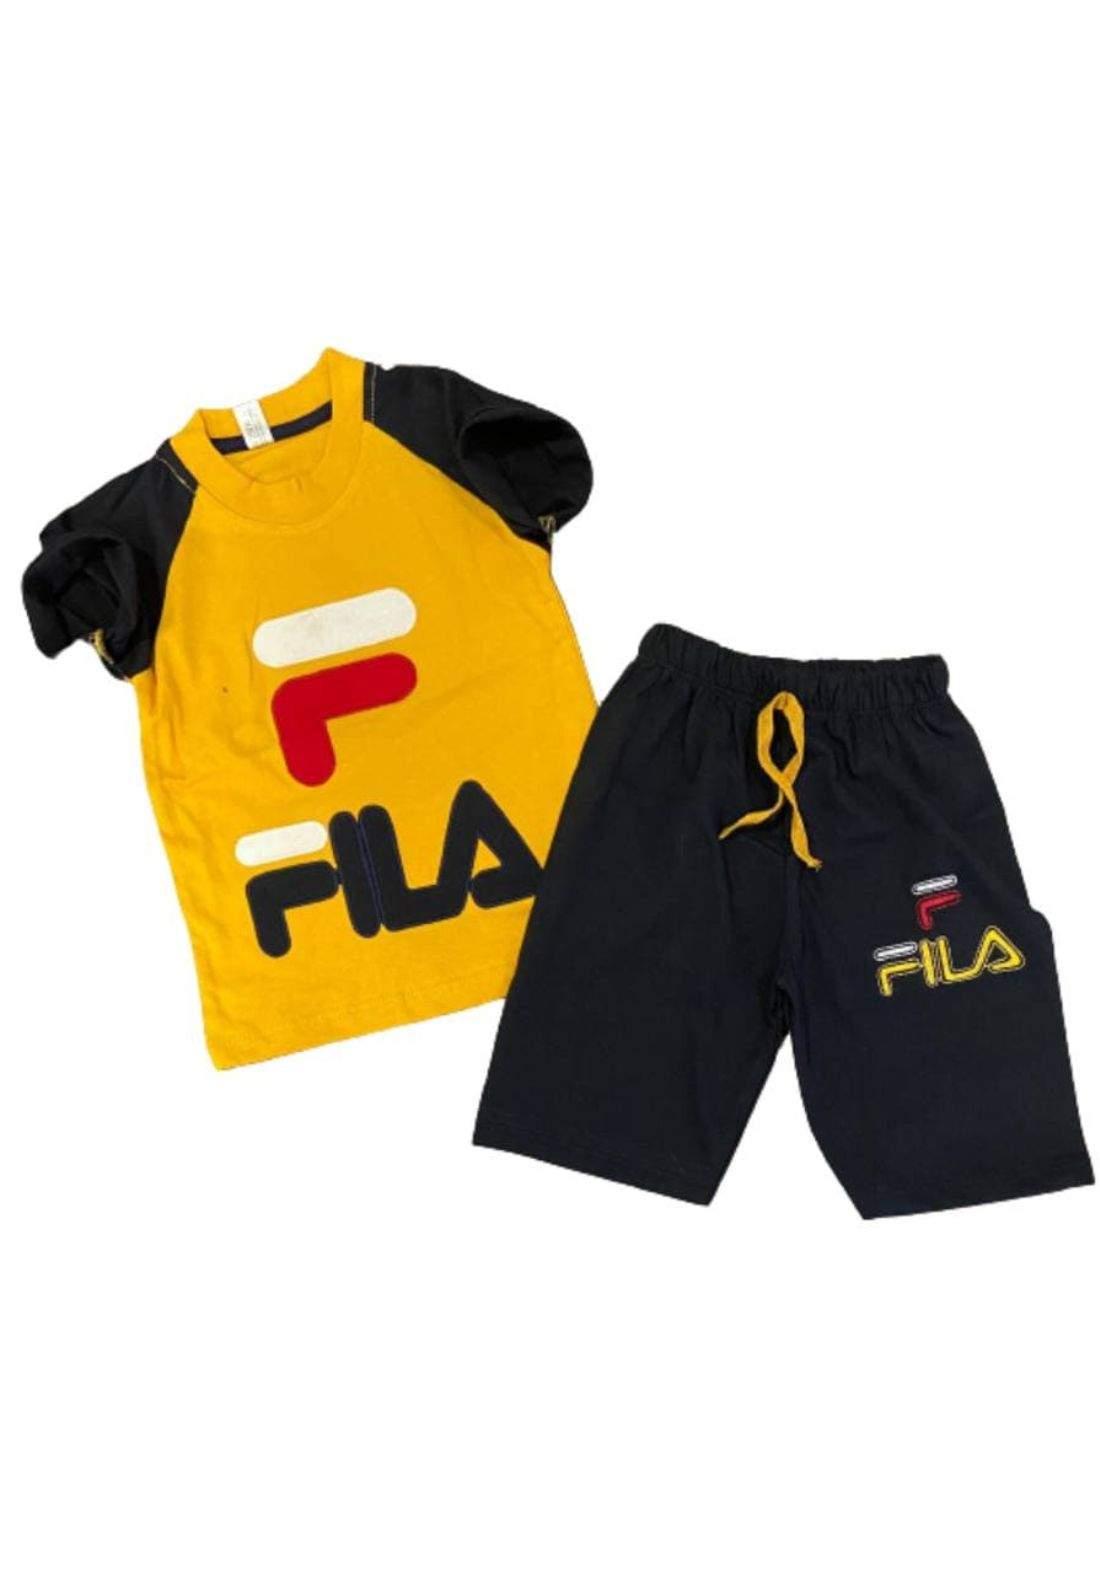 tracksuit for boys yellow (t-shirt+short) ( تراكسوت ولادي  اصفر (شورت و تيشيرت